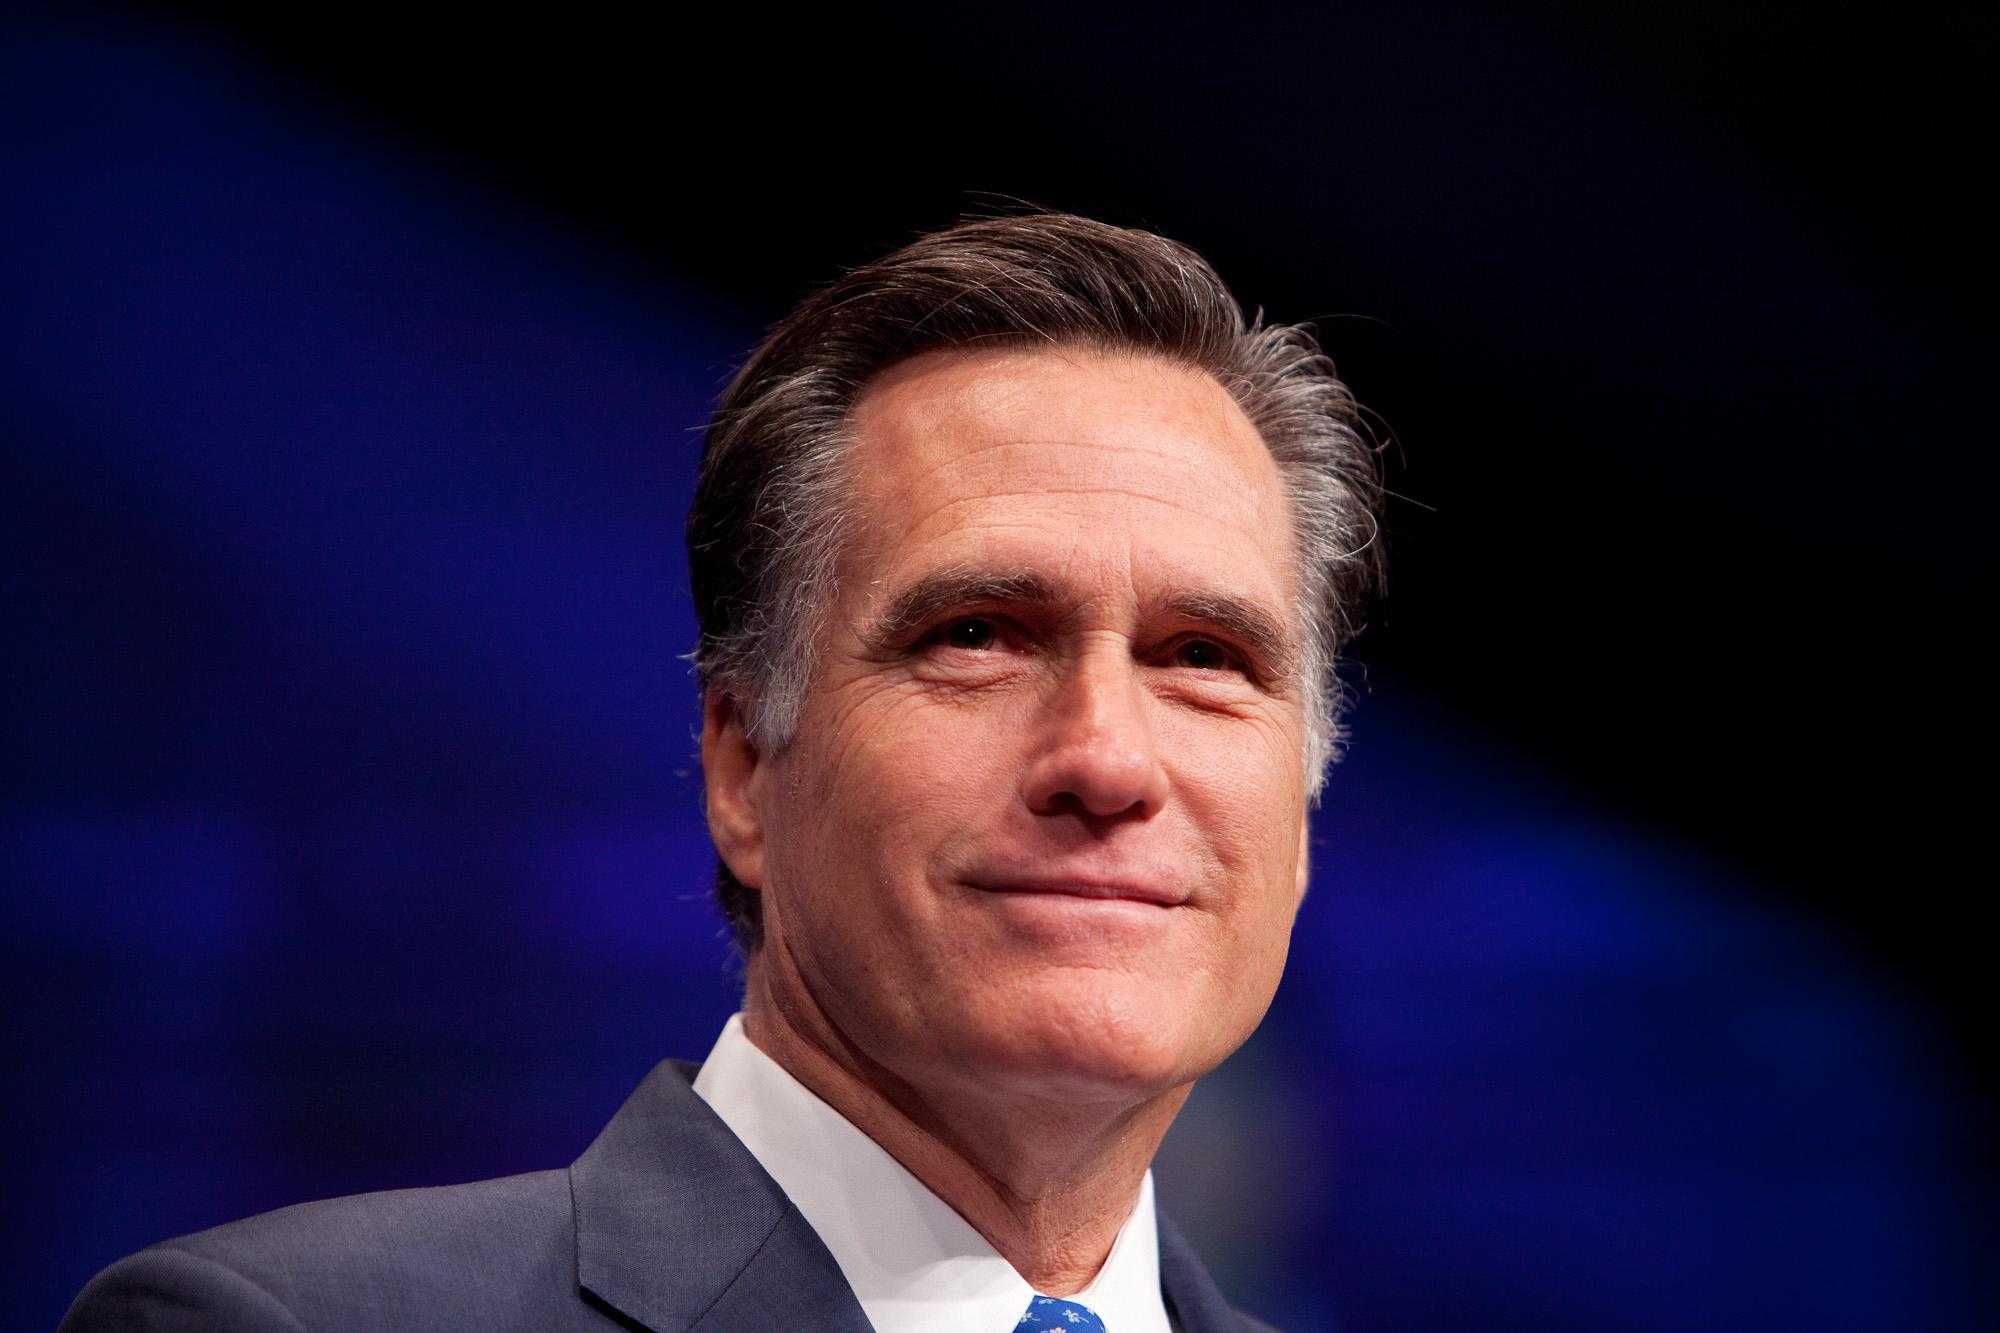 ... Of 7 Mitt Romney Mittromney Mitt Romney Mittromney The Presumptive ...